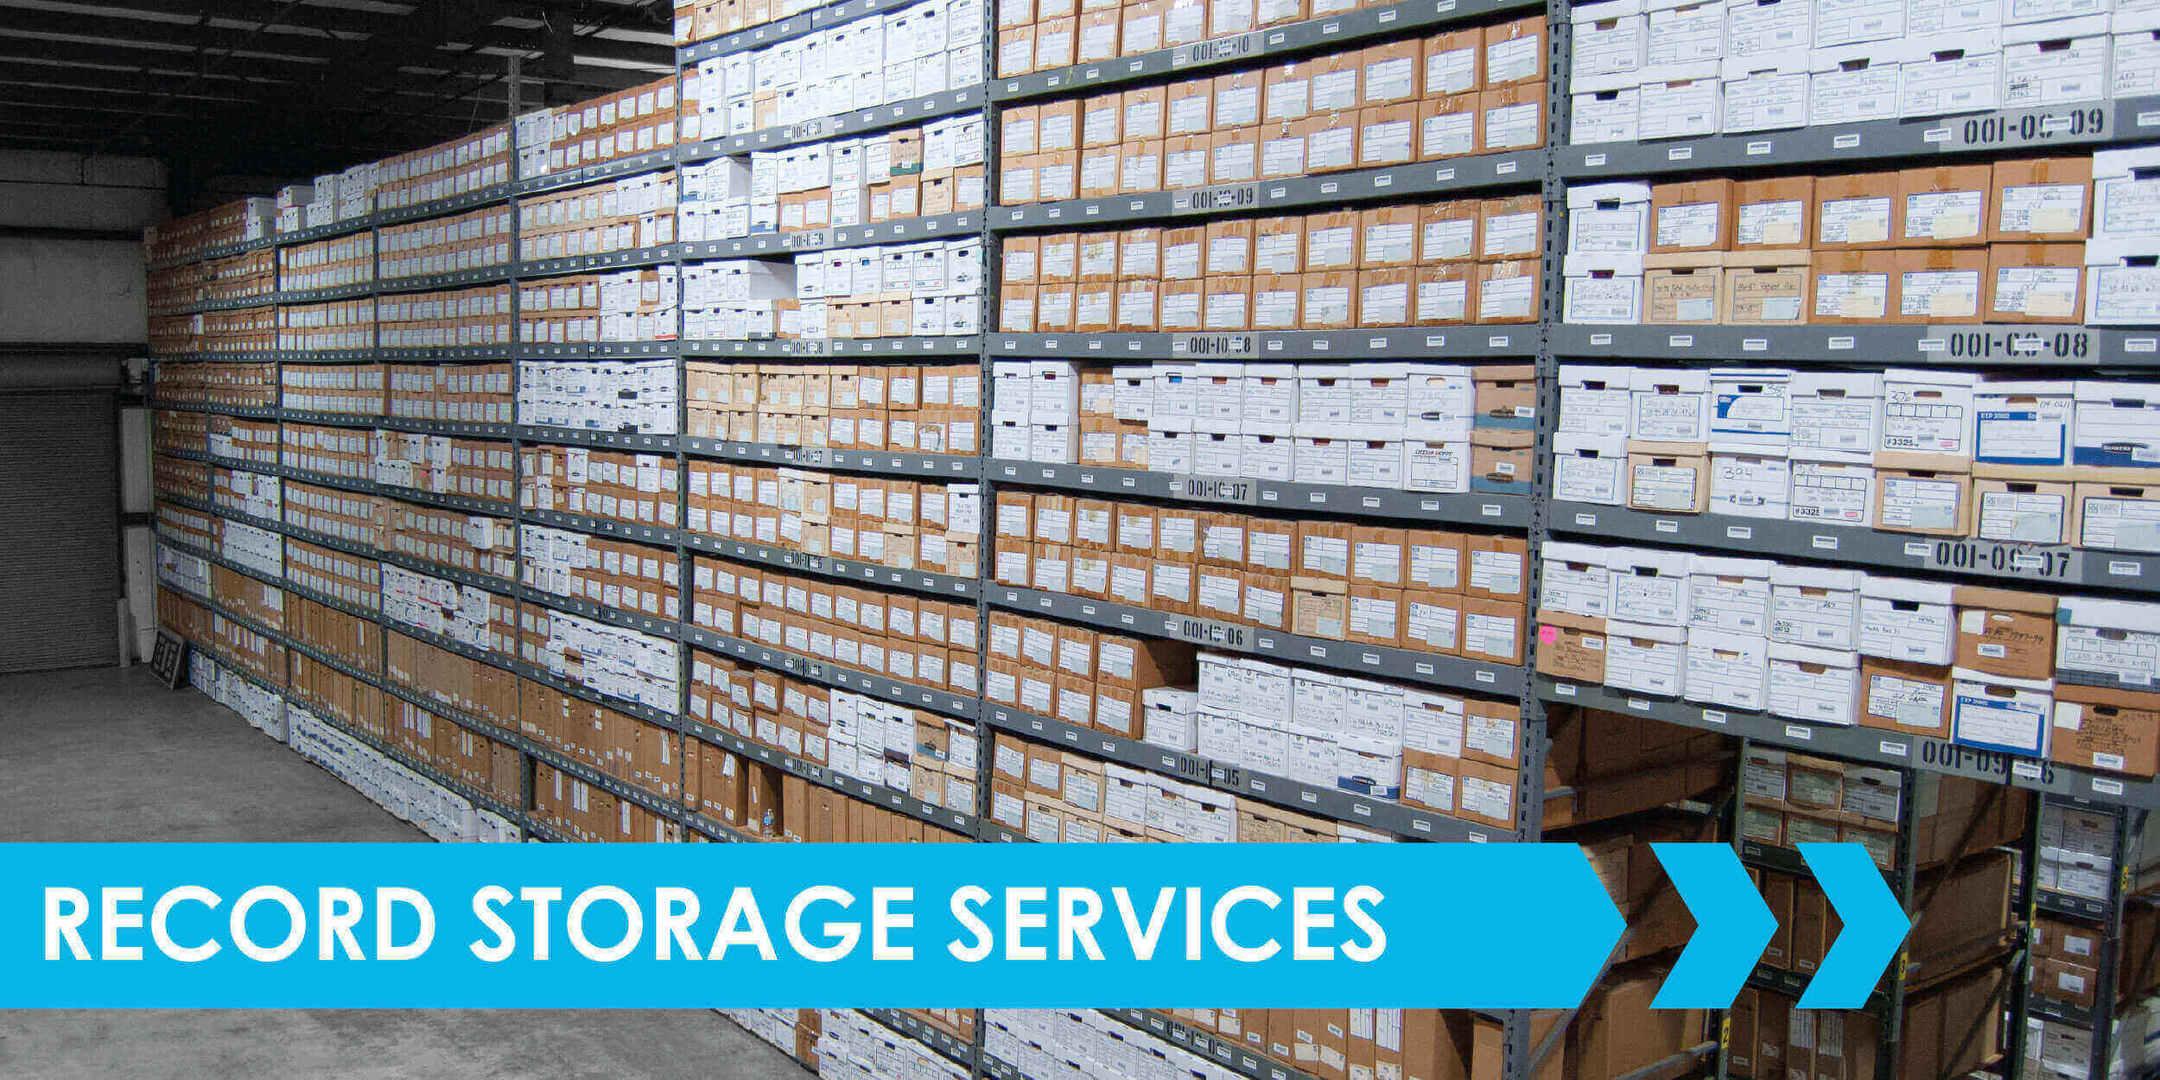 Records Storage Services